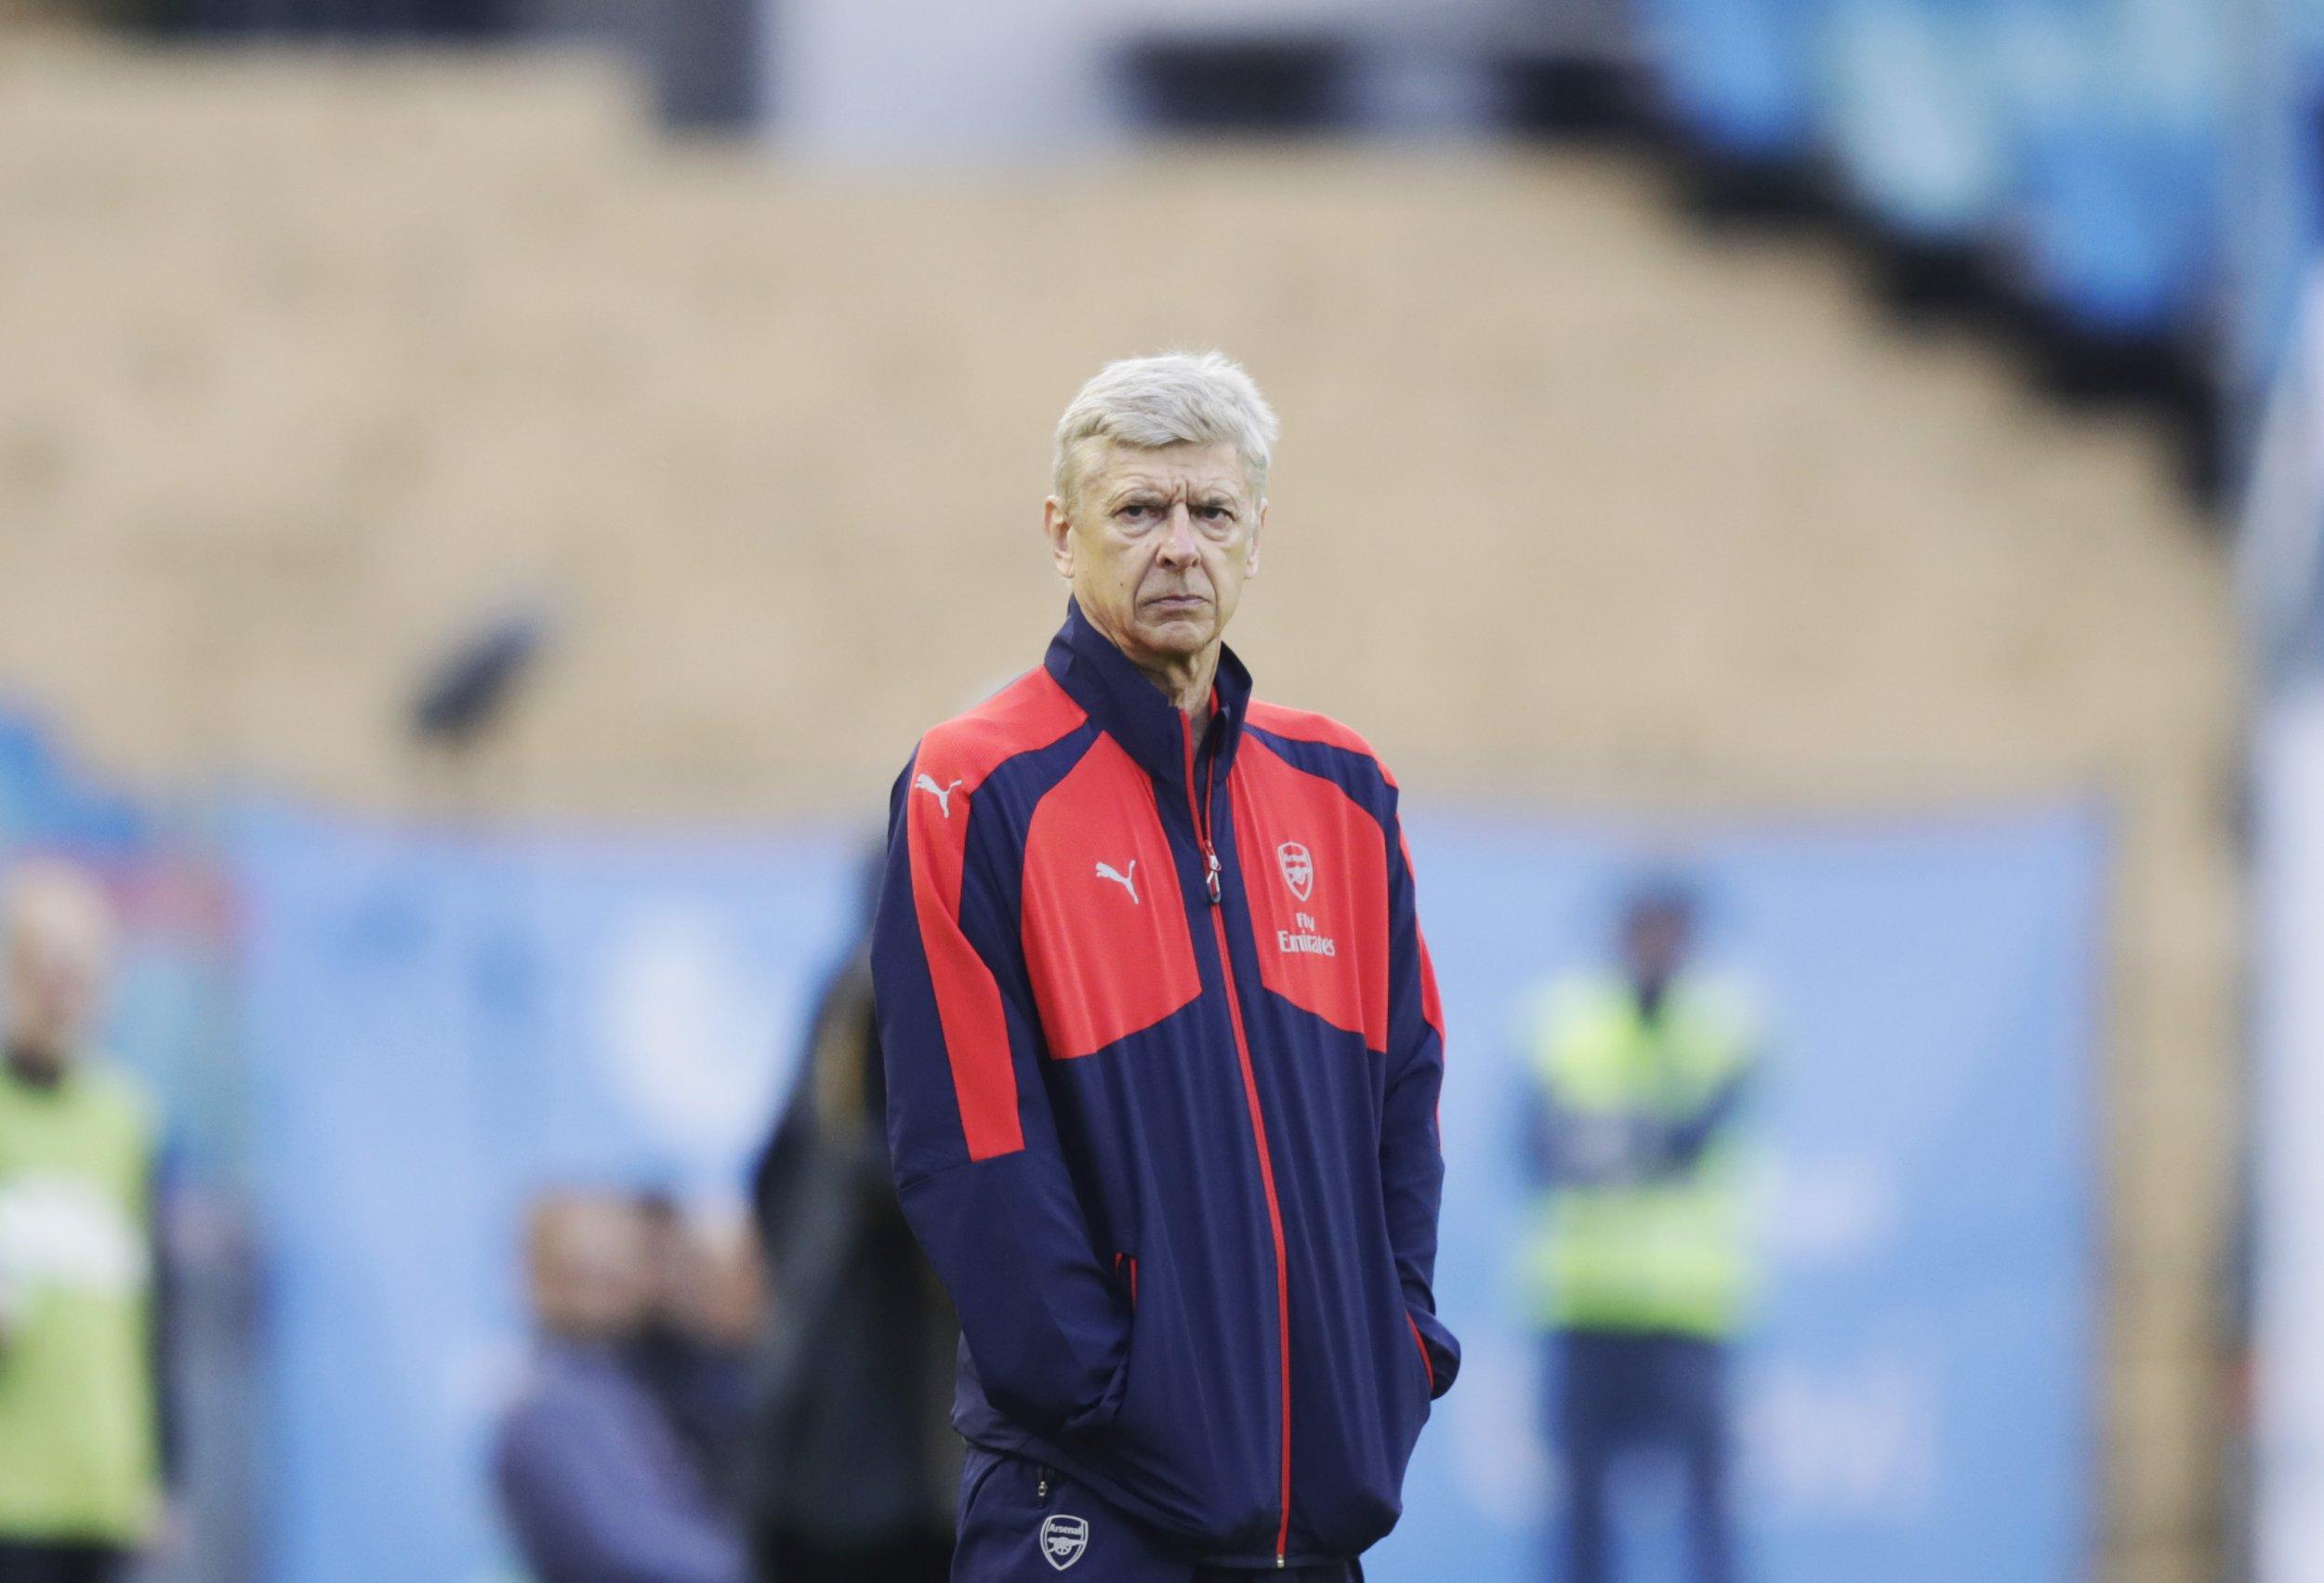 Arsenal: Arsene Wenger Gives Update on £50 Million-Rated Shkodran Mustafi